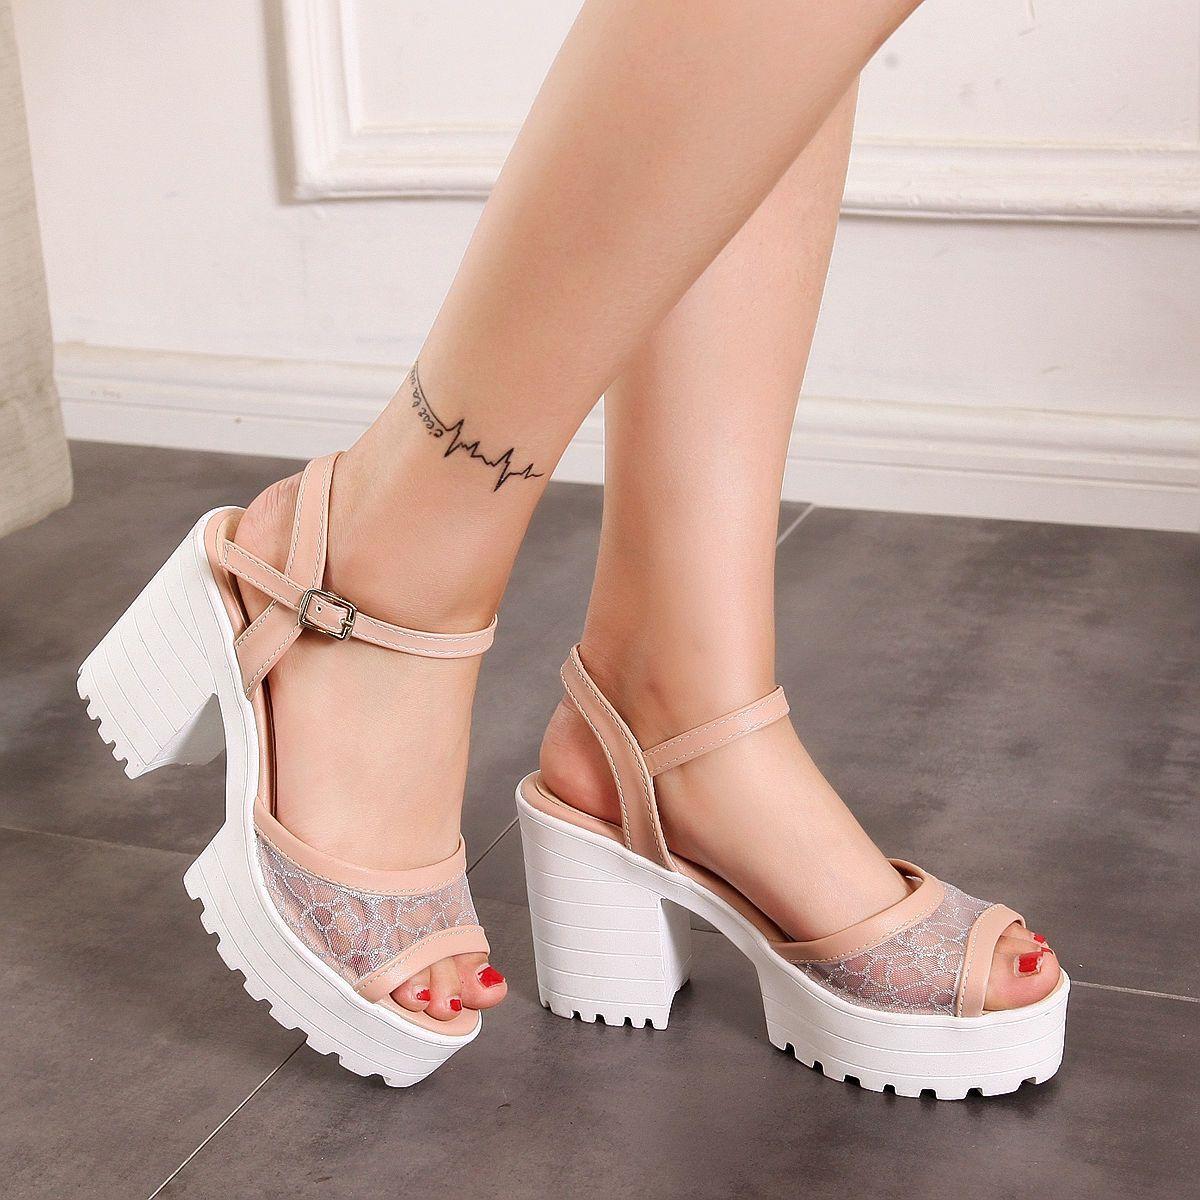 35d265c4634 Korean Sandals Women S Shoes High Block Heels Mesh Sweet Mary Janes  Platforms